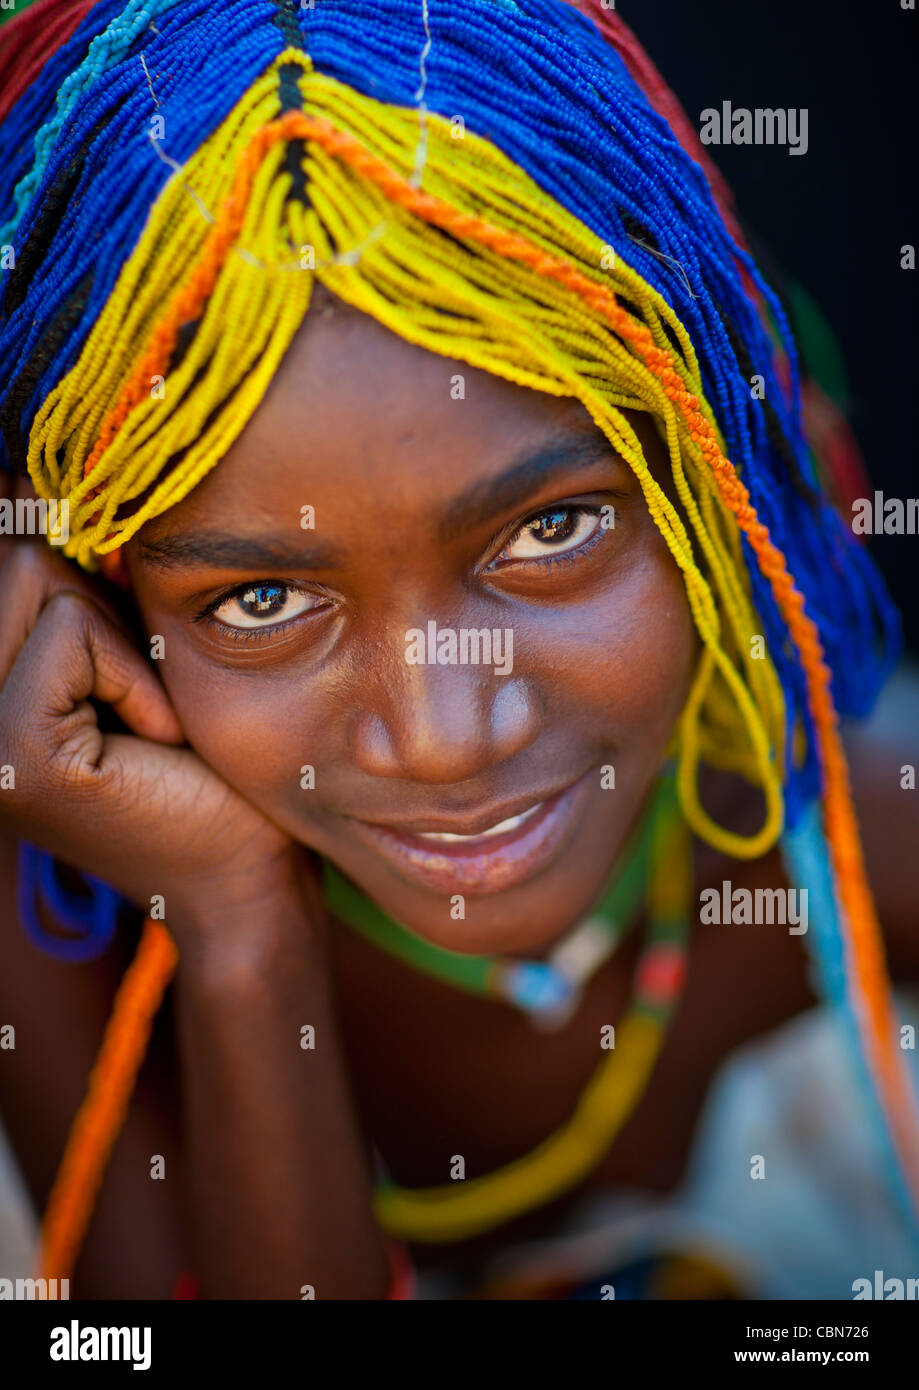 Mudimba Girl avec une perruque de perles appelé Misses Ena, Village d'Combelo, Angola Photo Stock